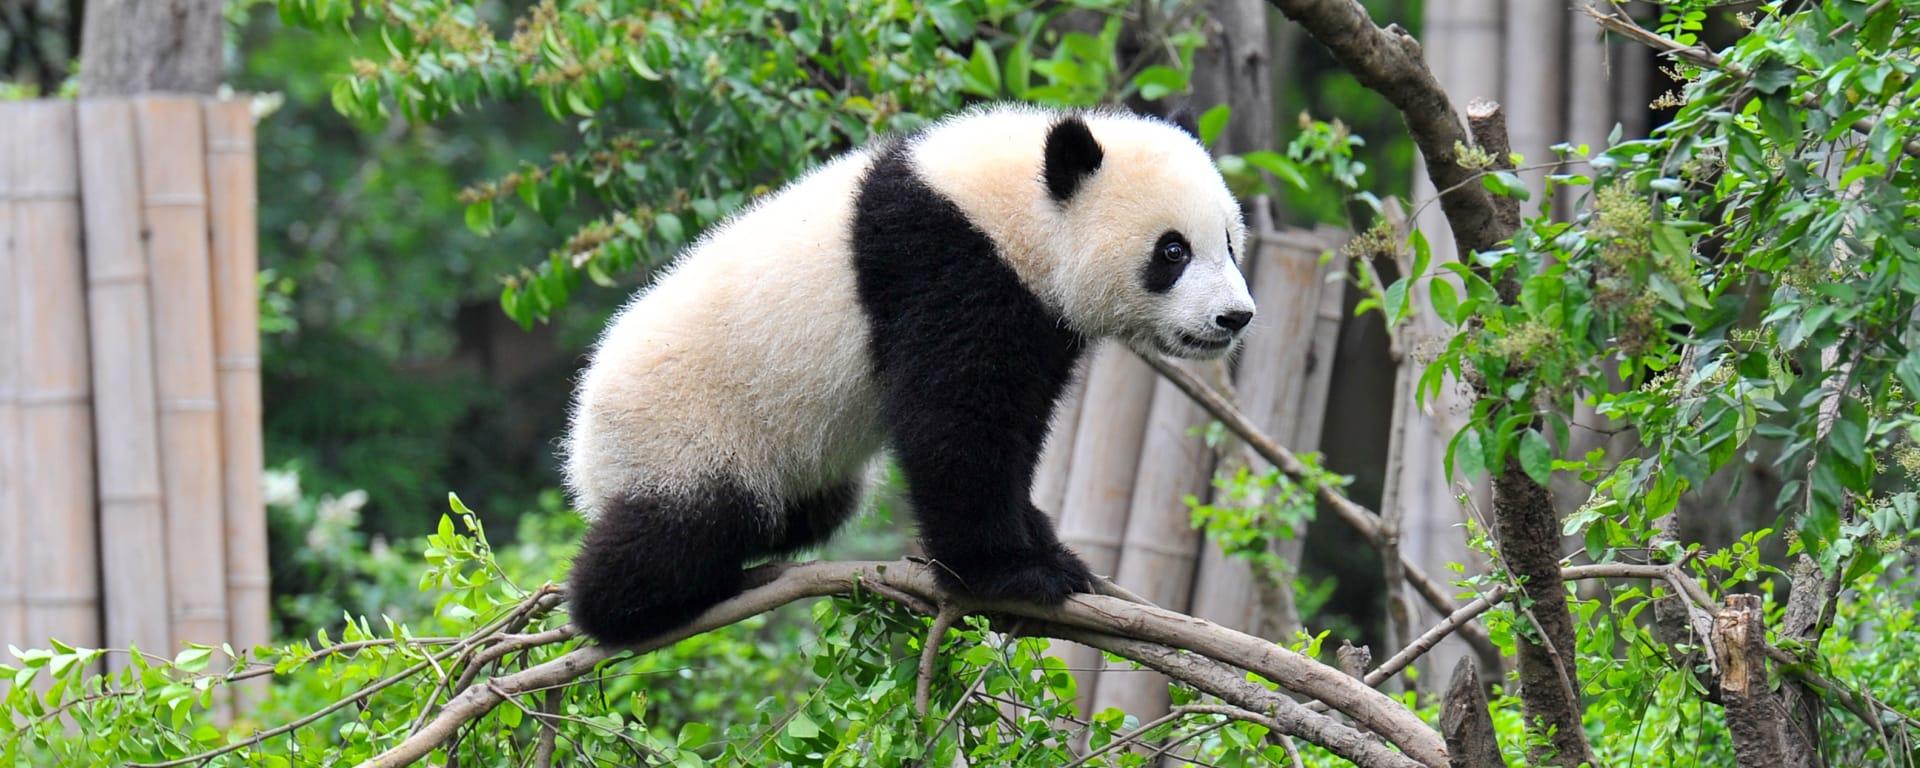 China entdecken mit Tischler Reisen: 1cn-giant-panda-bear-standing-on-tree-st-2015-Hung Chung Chih